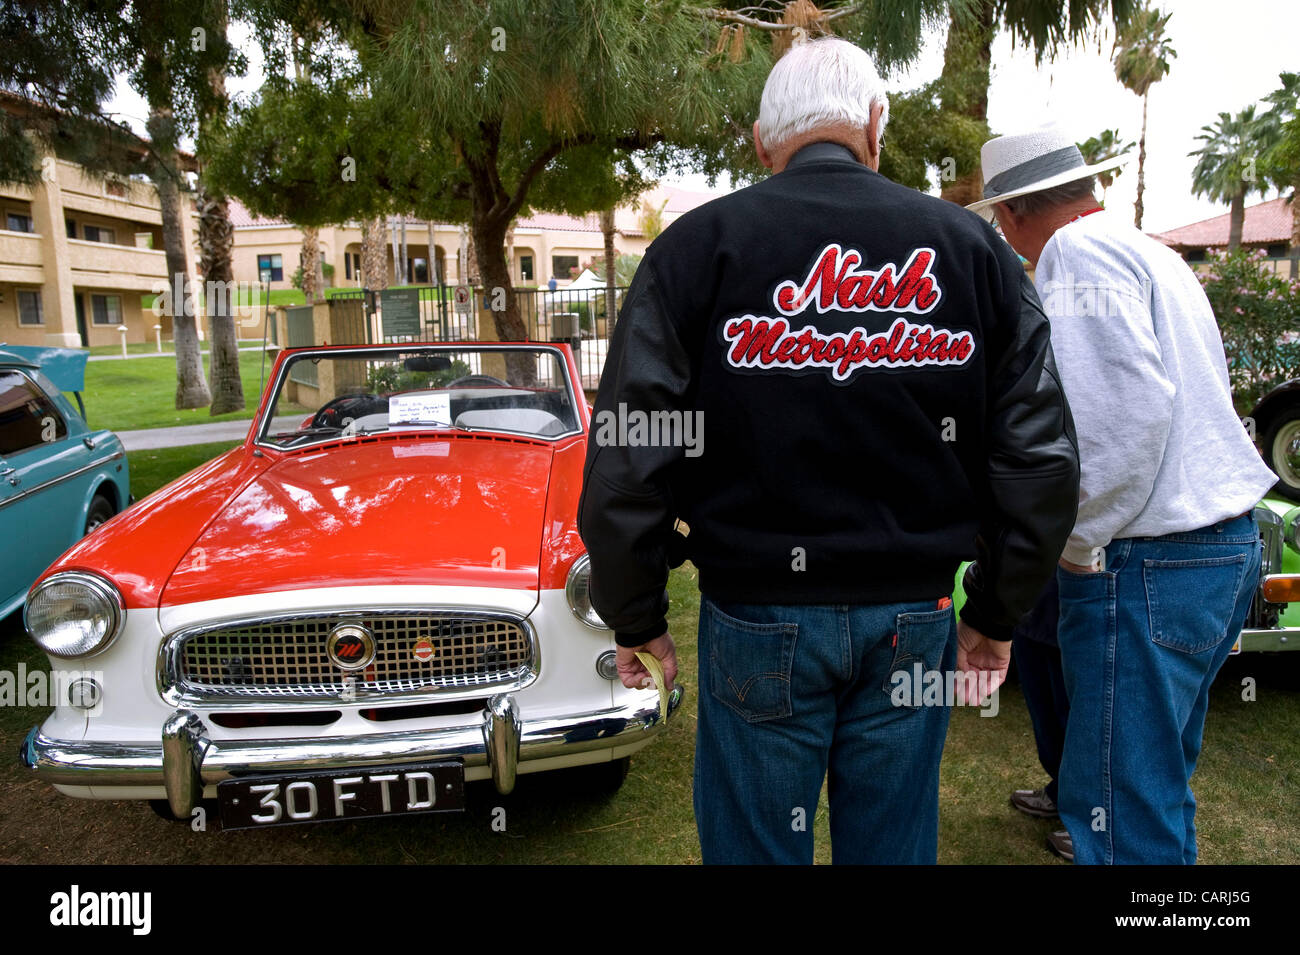 April 14, 2012 - Phoeniz, AZ, USA -  Mini car enthusiasts gather for a rally of approximately 60 micro and mini Stock Photo